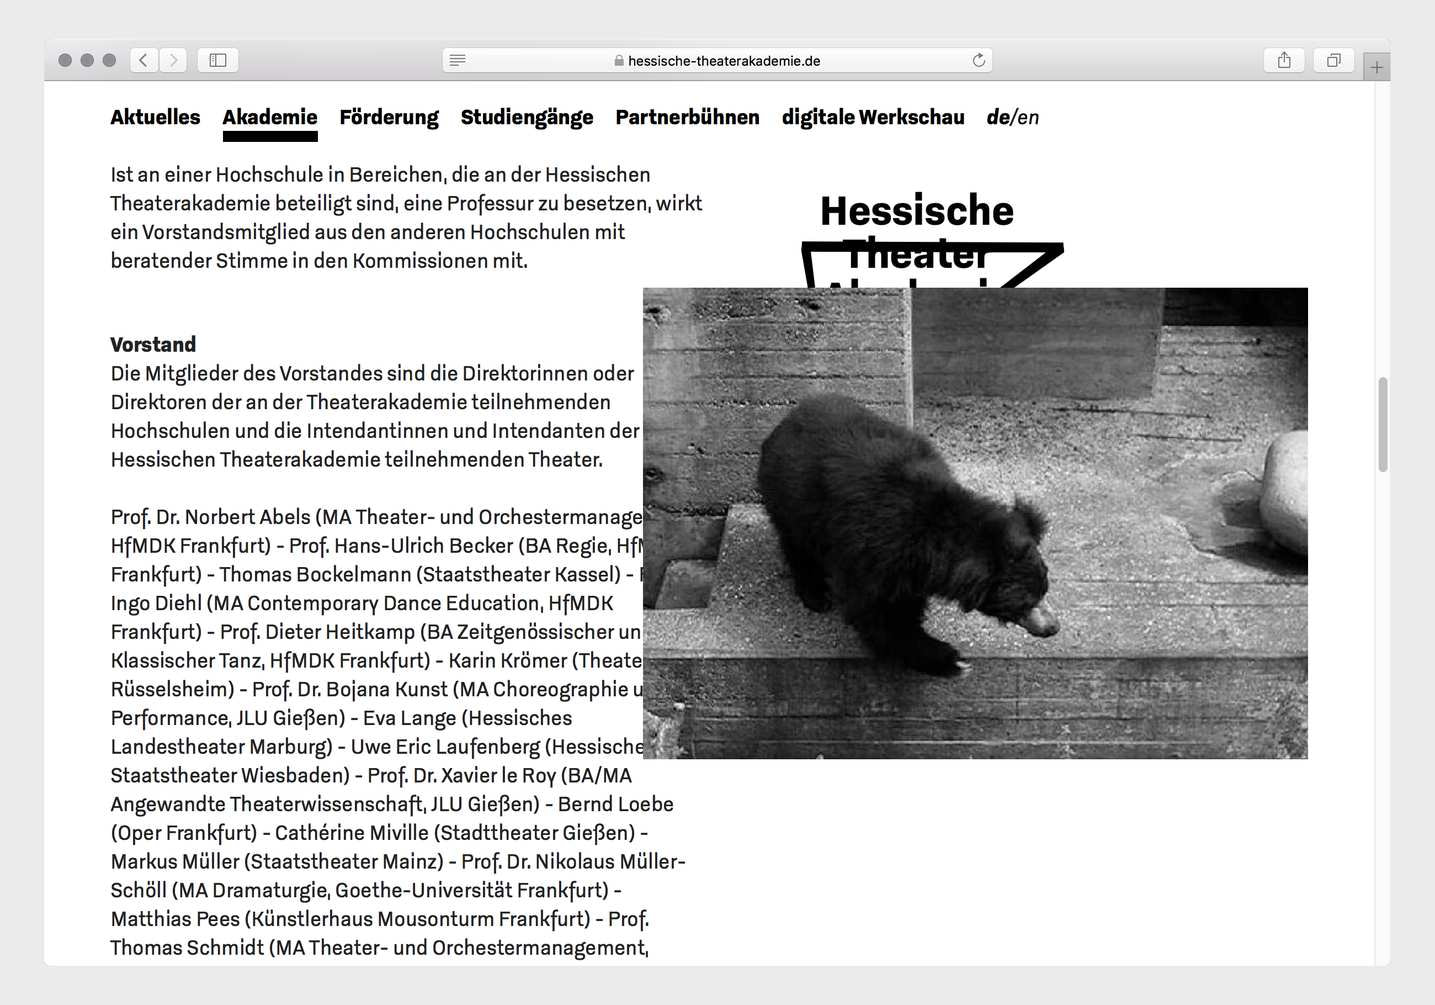 hta-website-5-1435x1004px